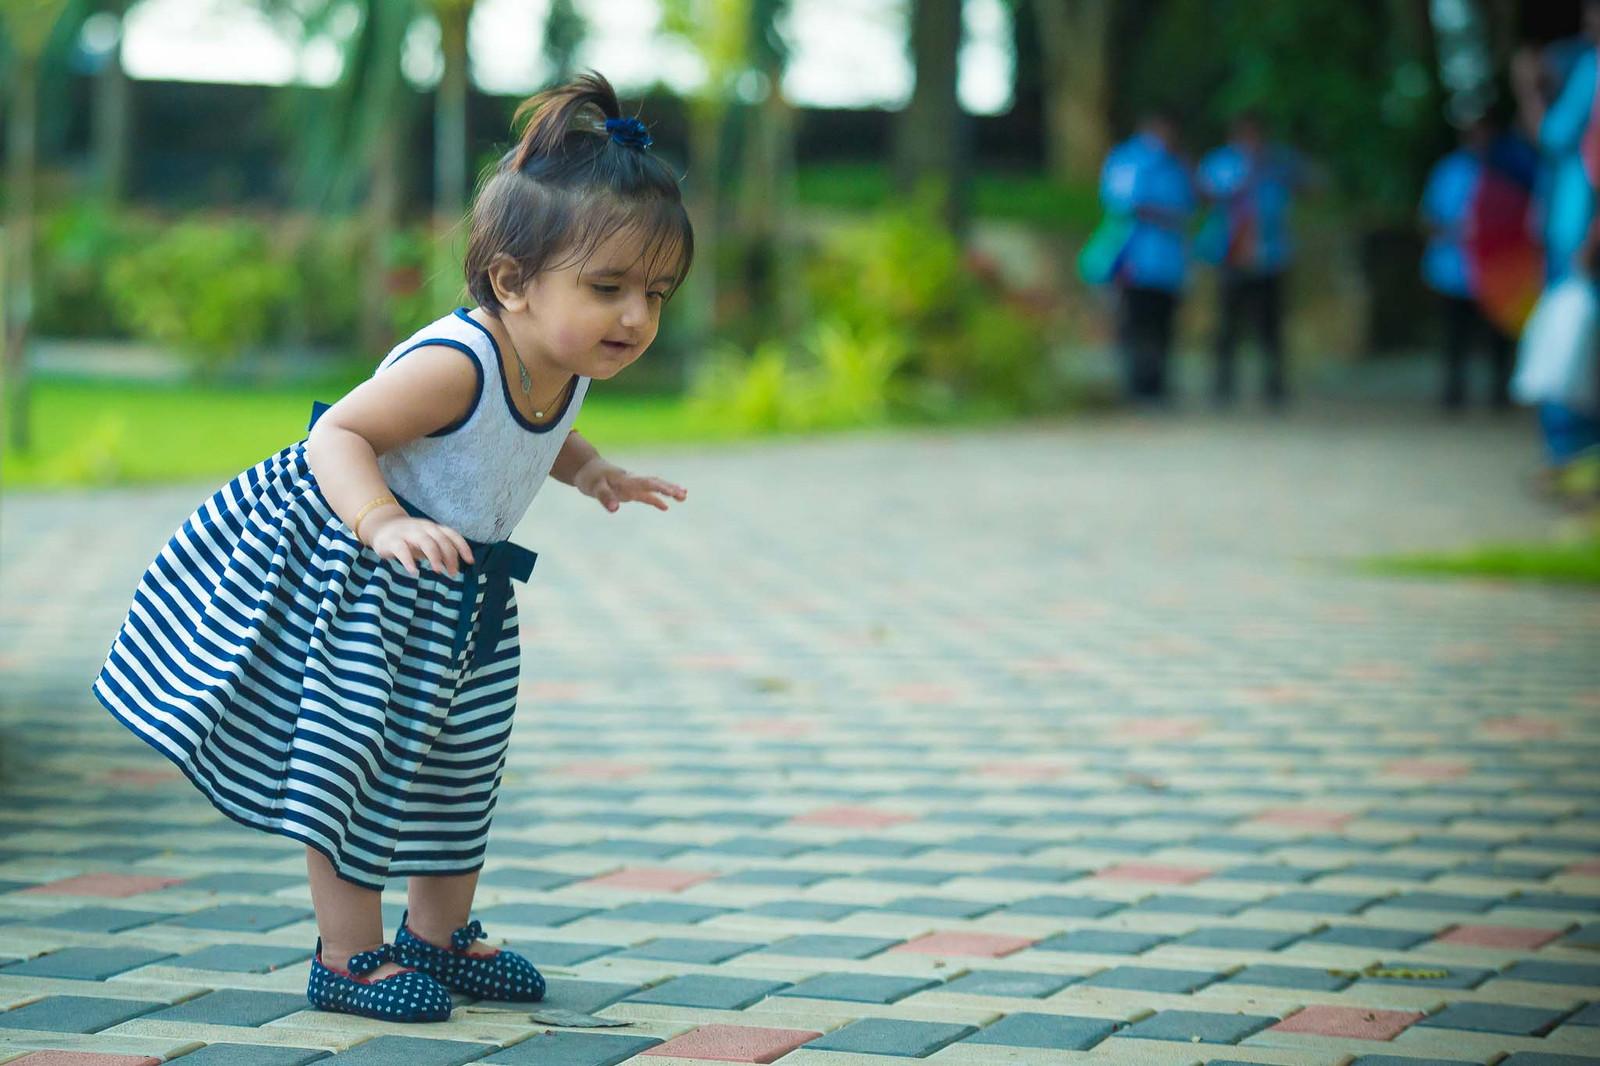 D3scochin family and kids photography in kochi kerala and dubai